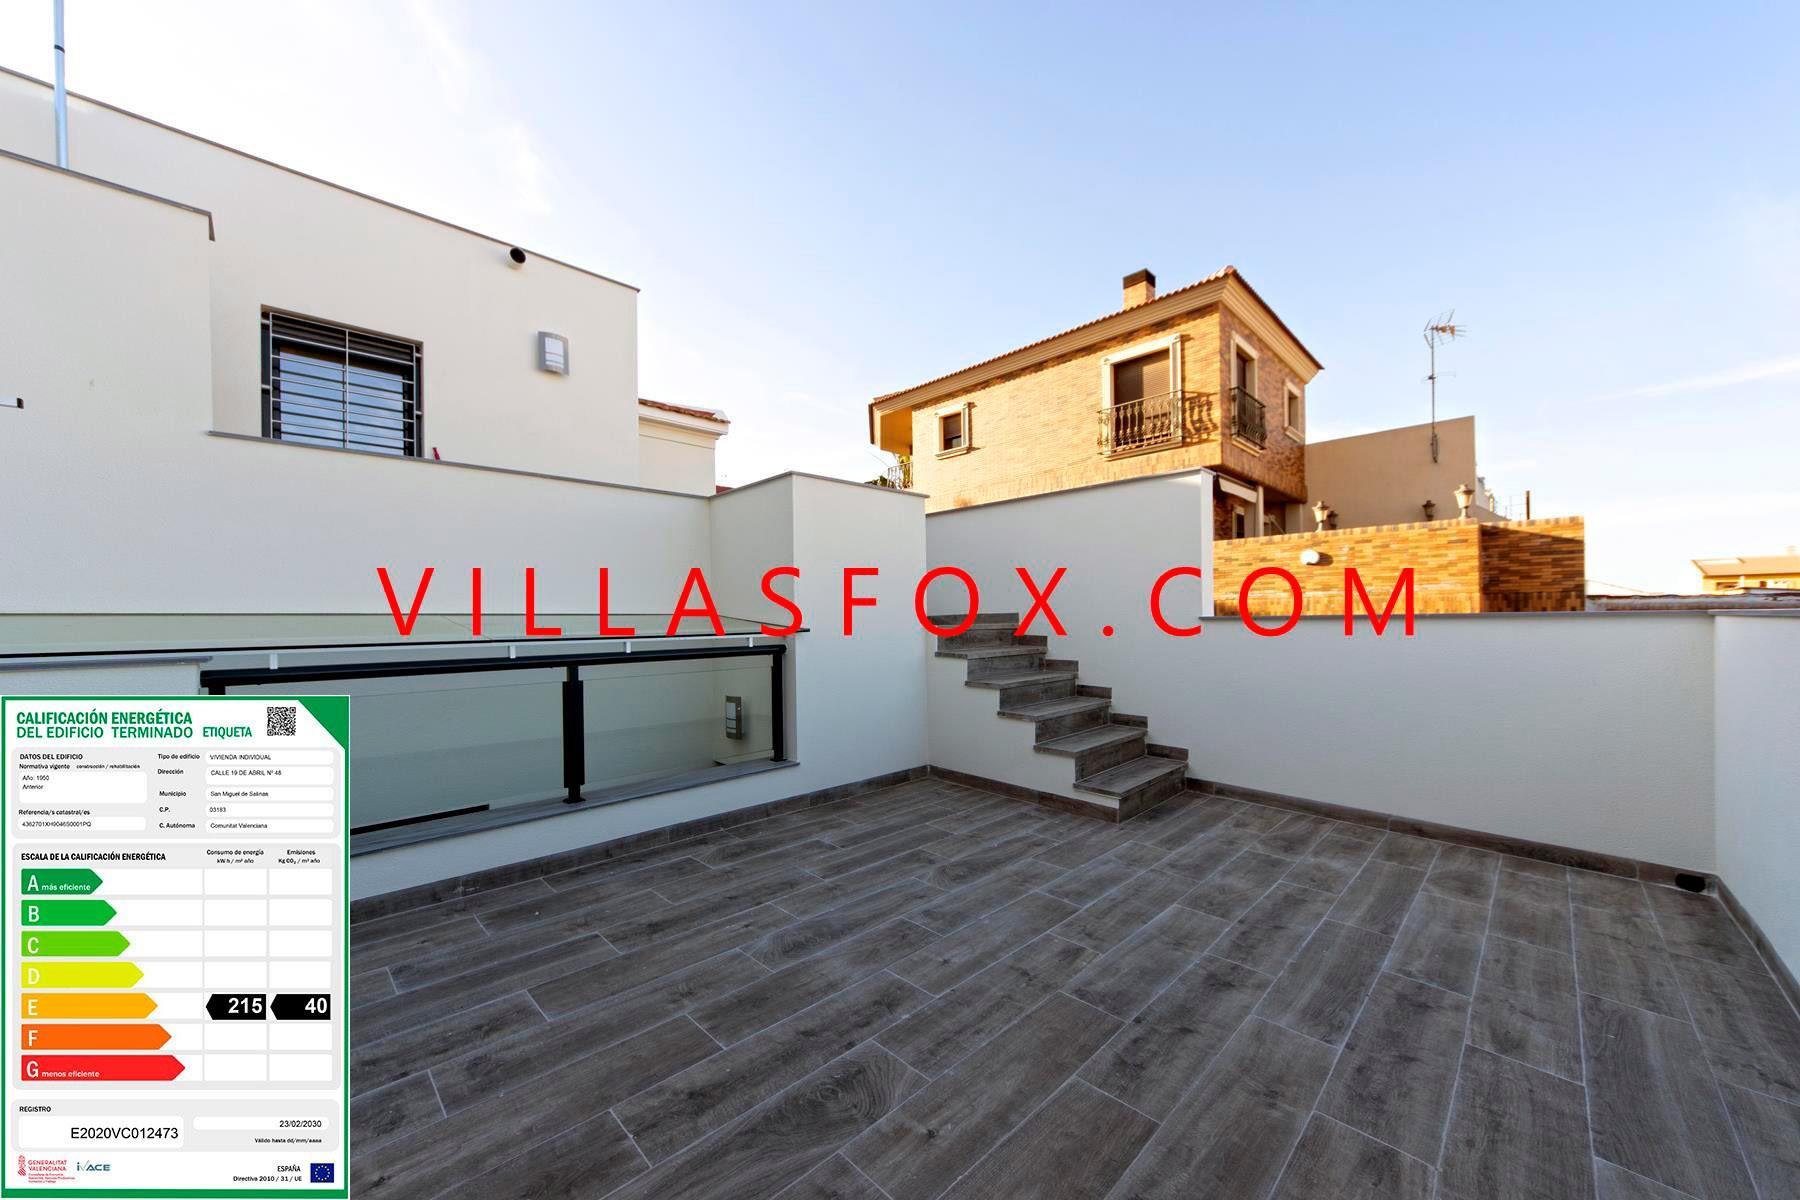 San Miguel de Salinas modernised house for sale town centre